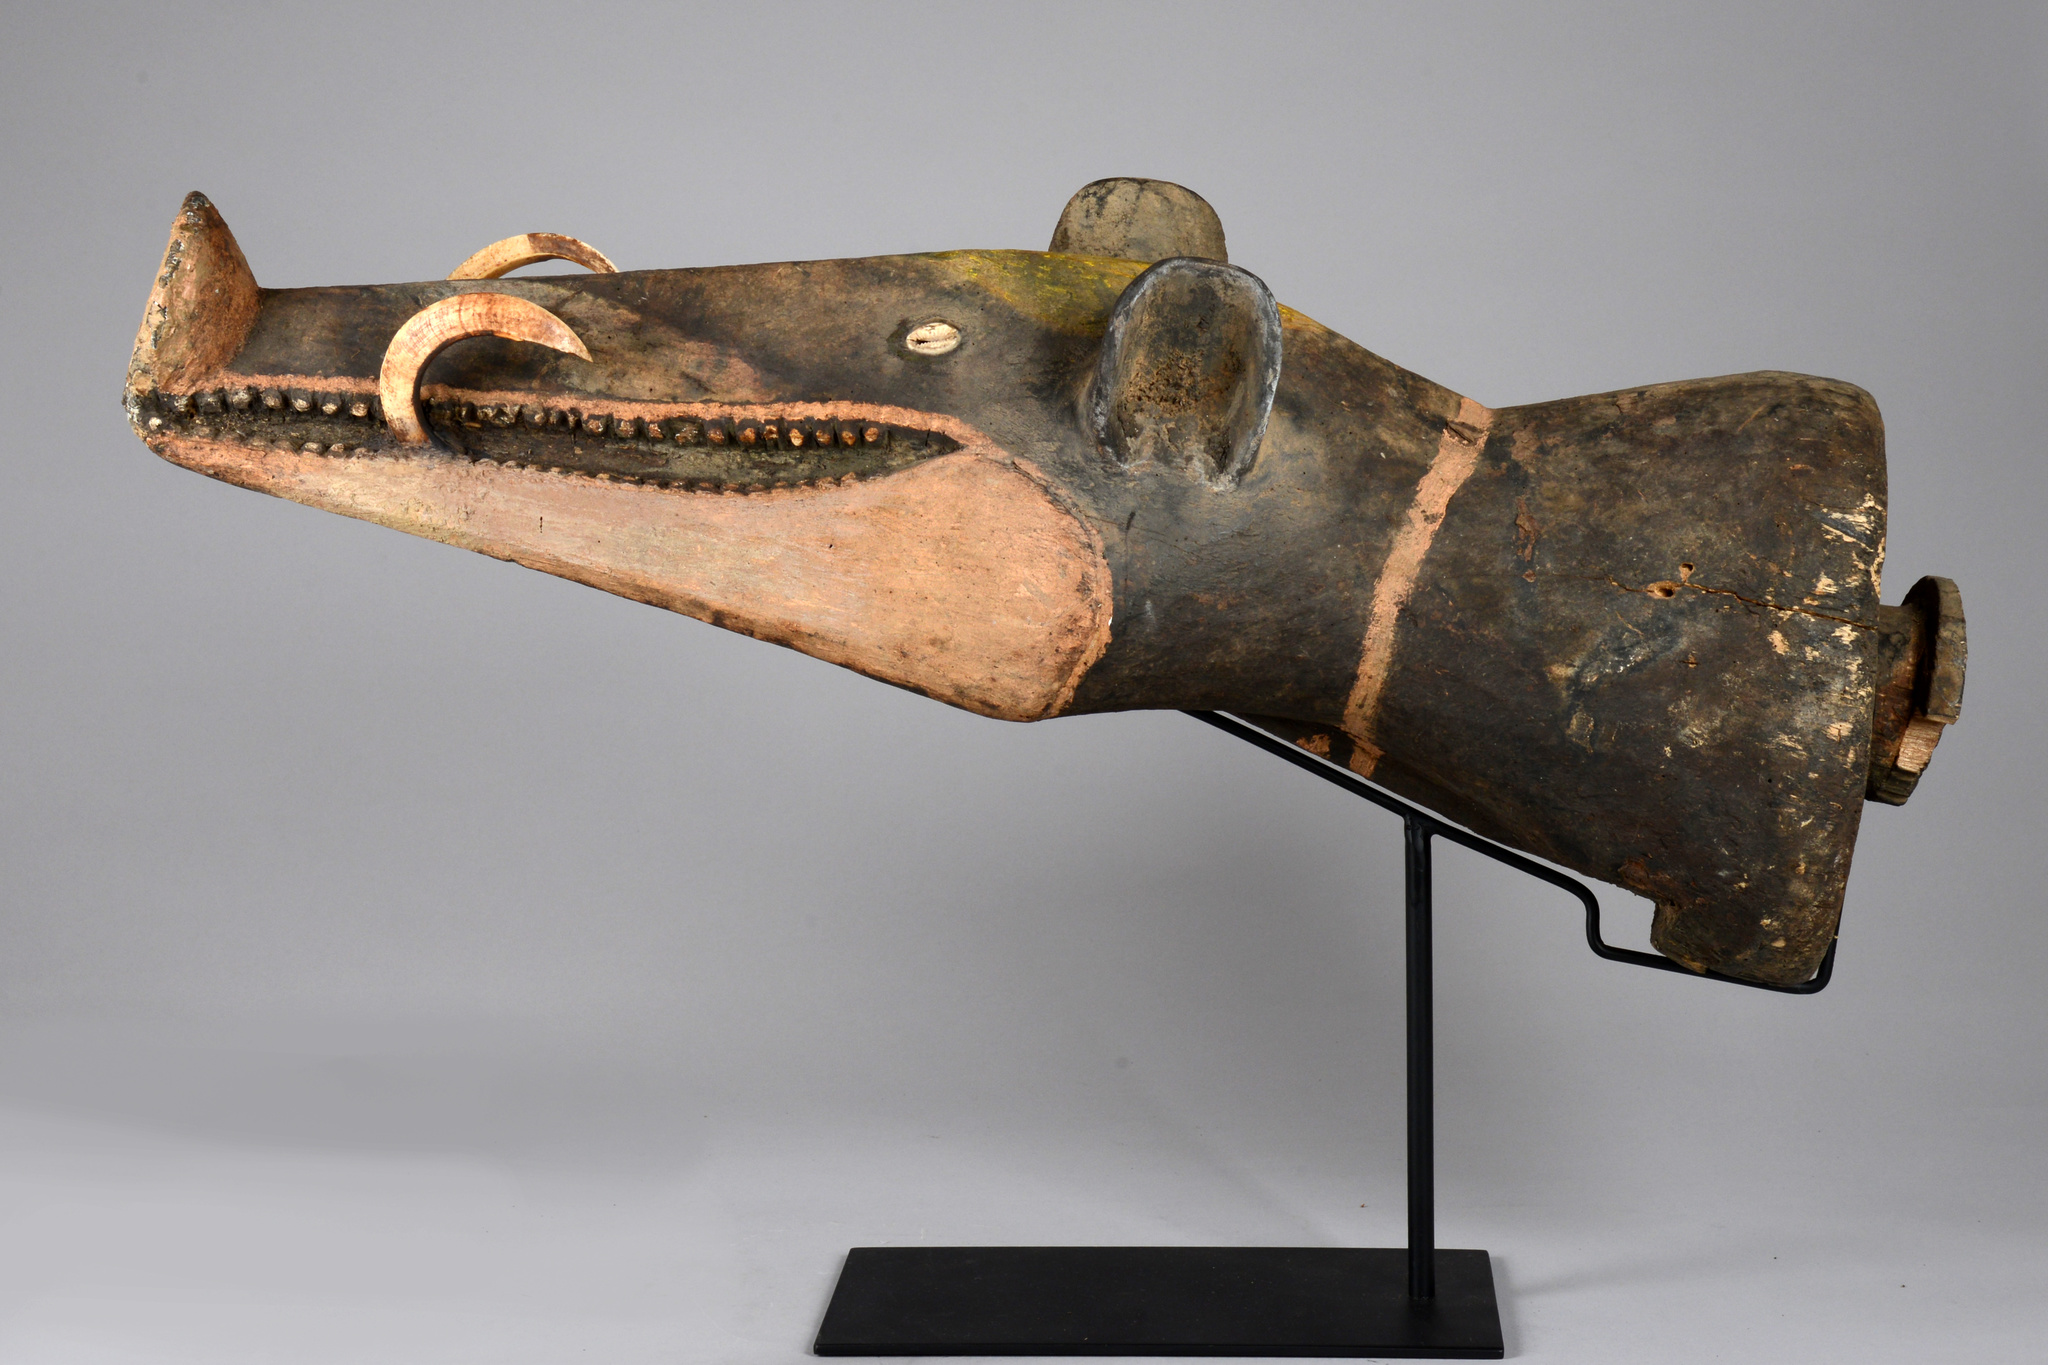 Headpiece of a large mask ensemble